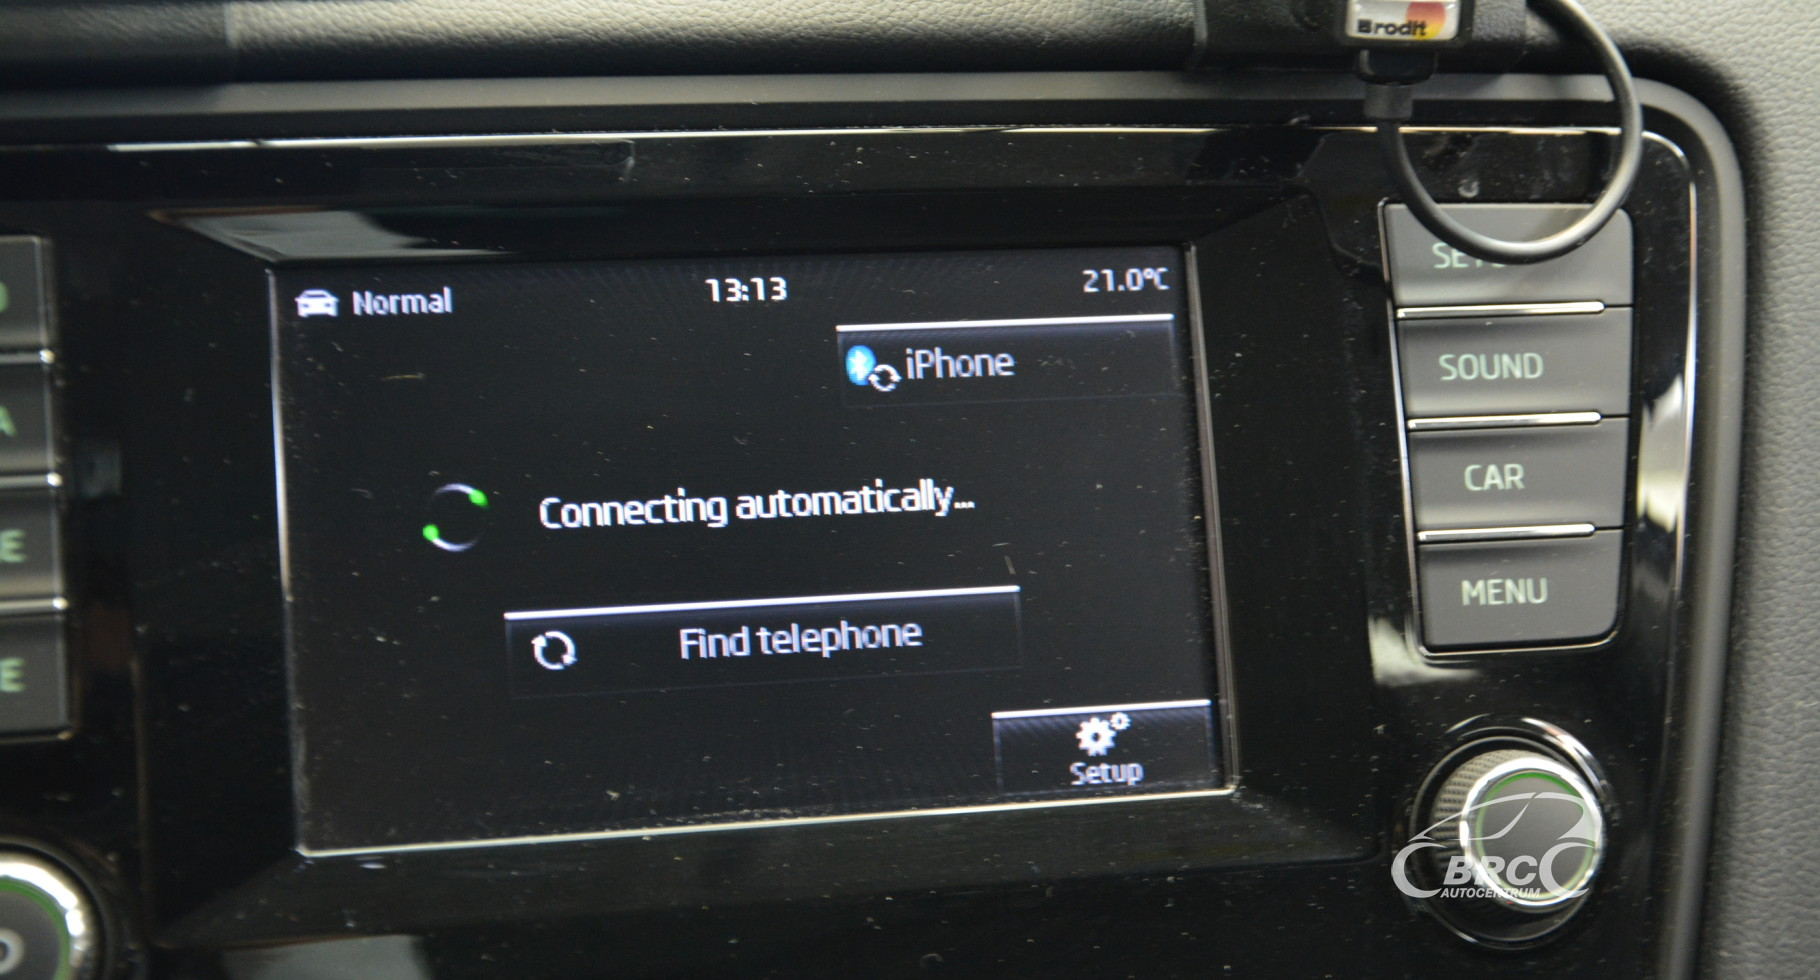 Skoda Octavia 2.0 TDI 4x4 Scout Automatas